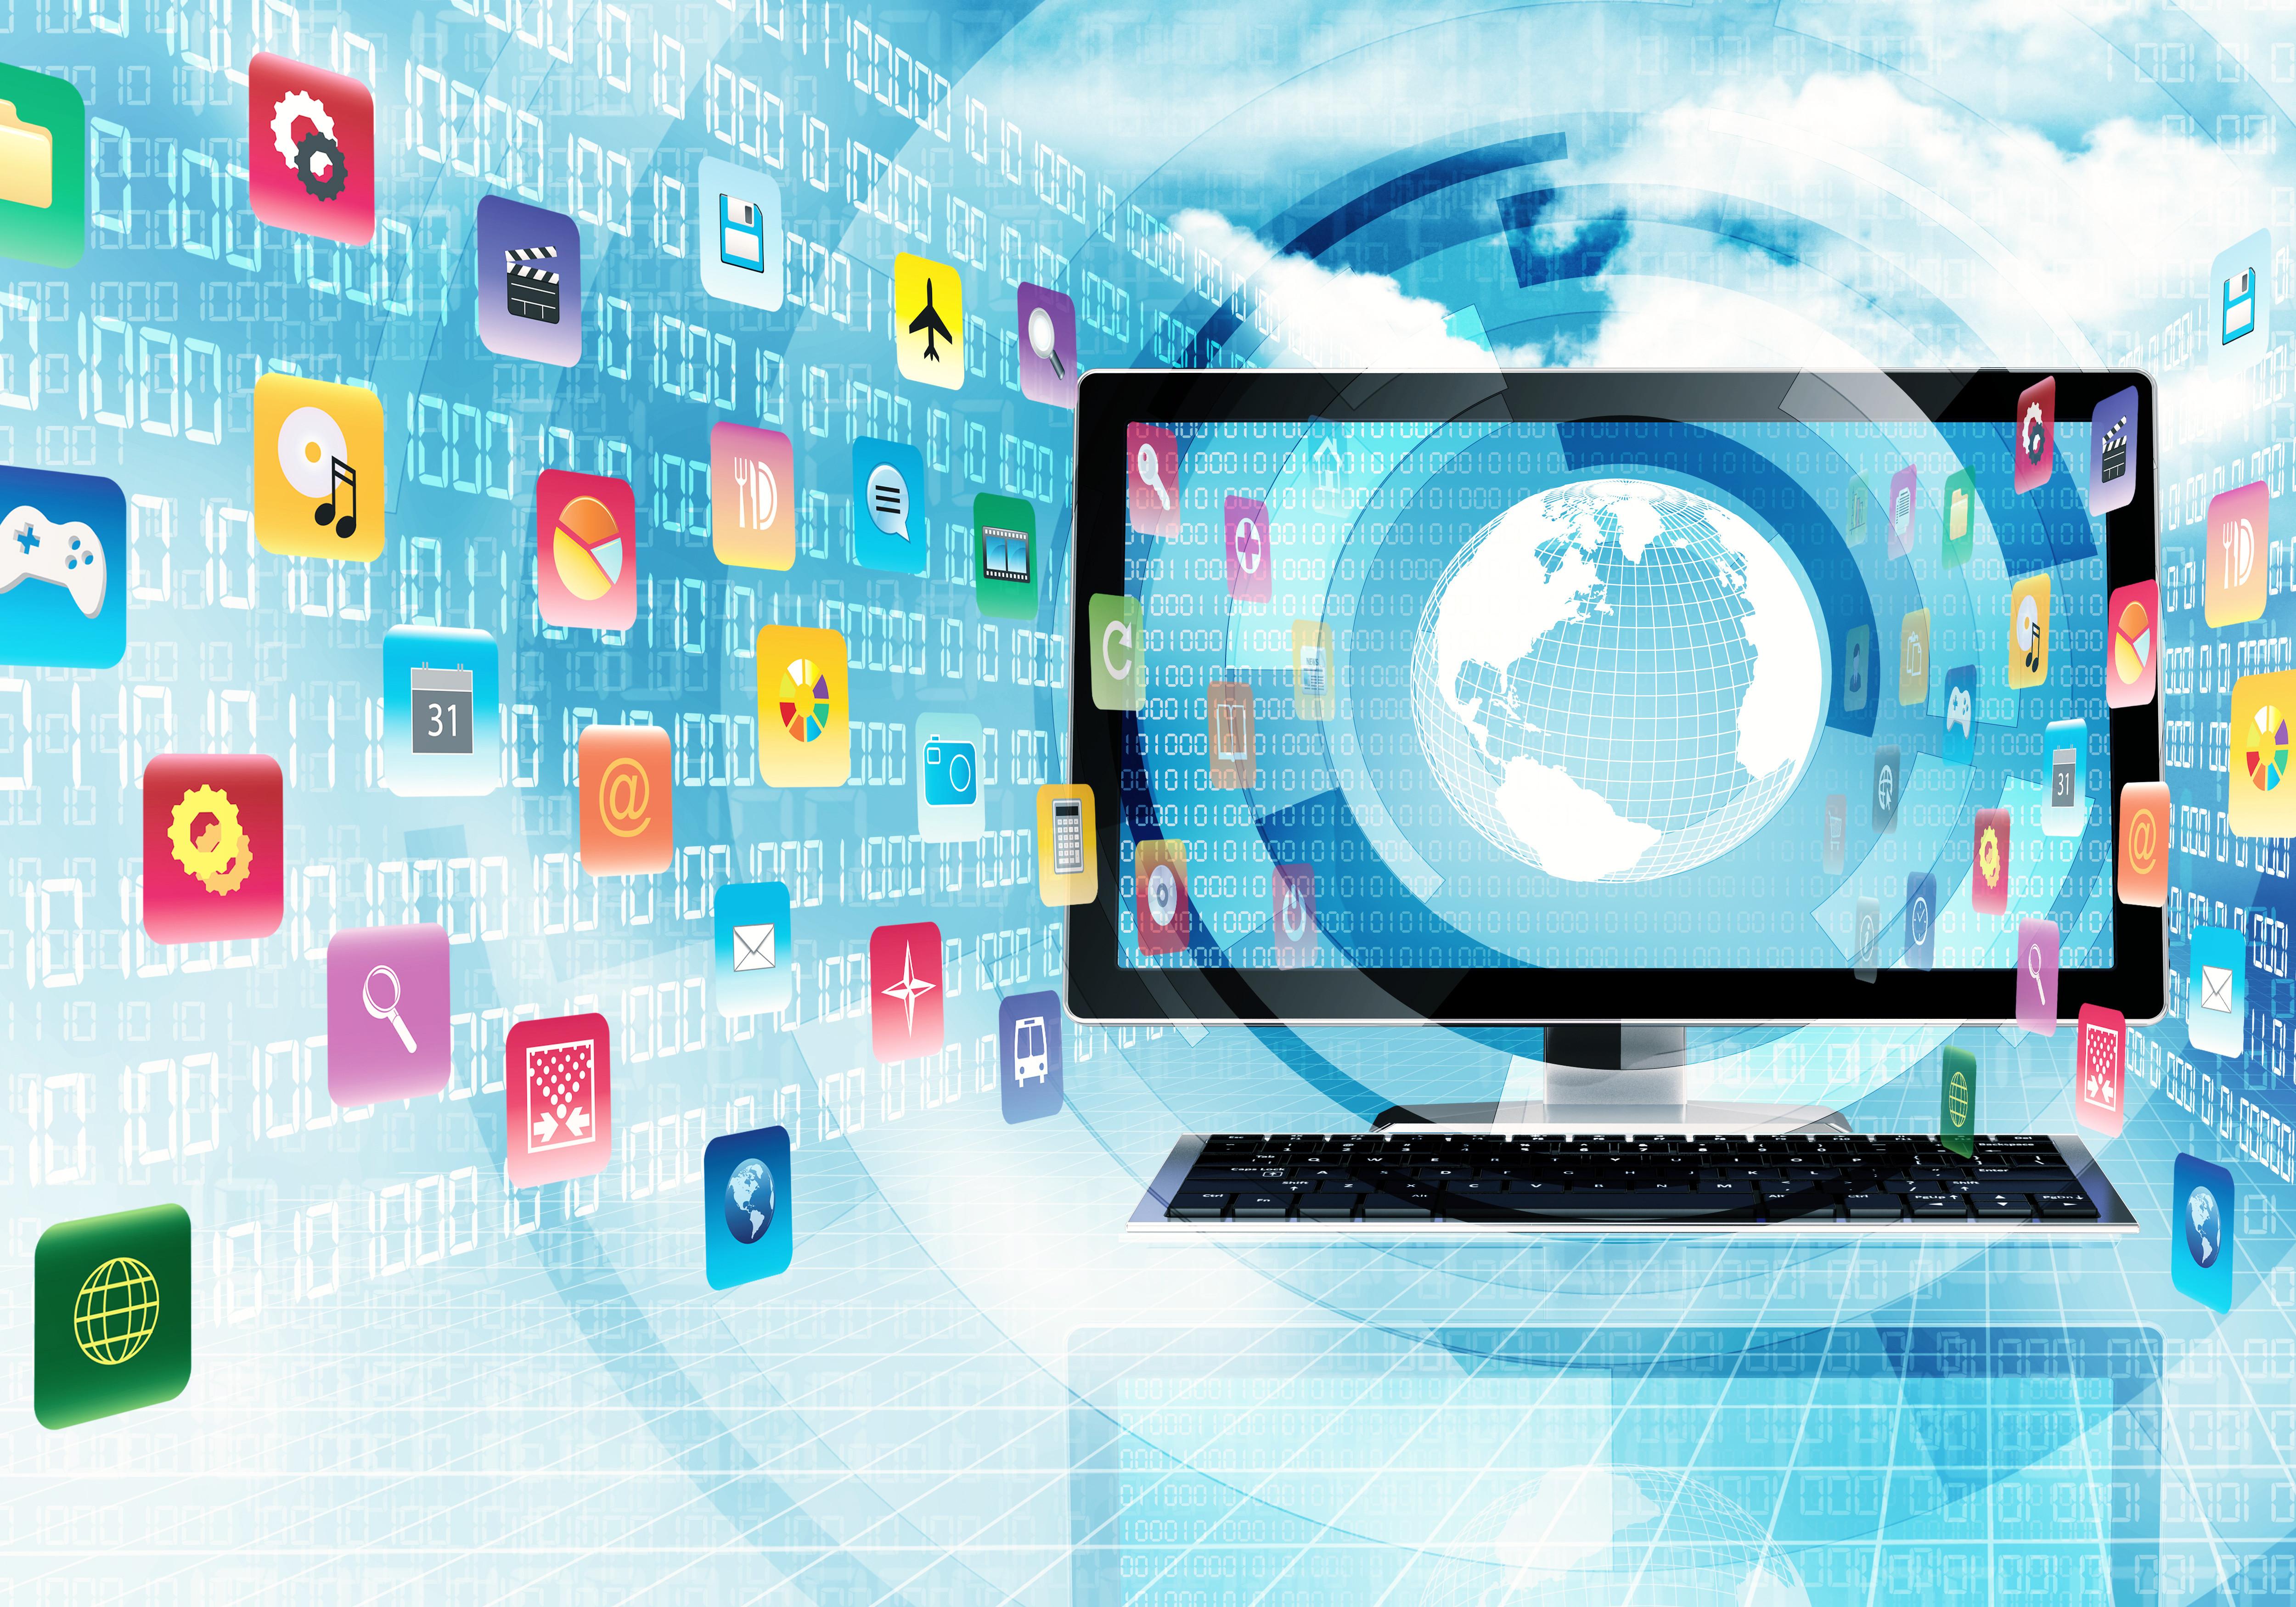 Digital Consultation - Internet based